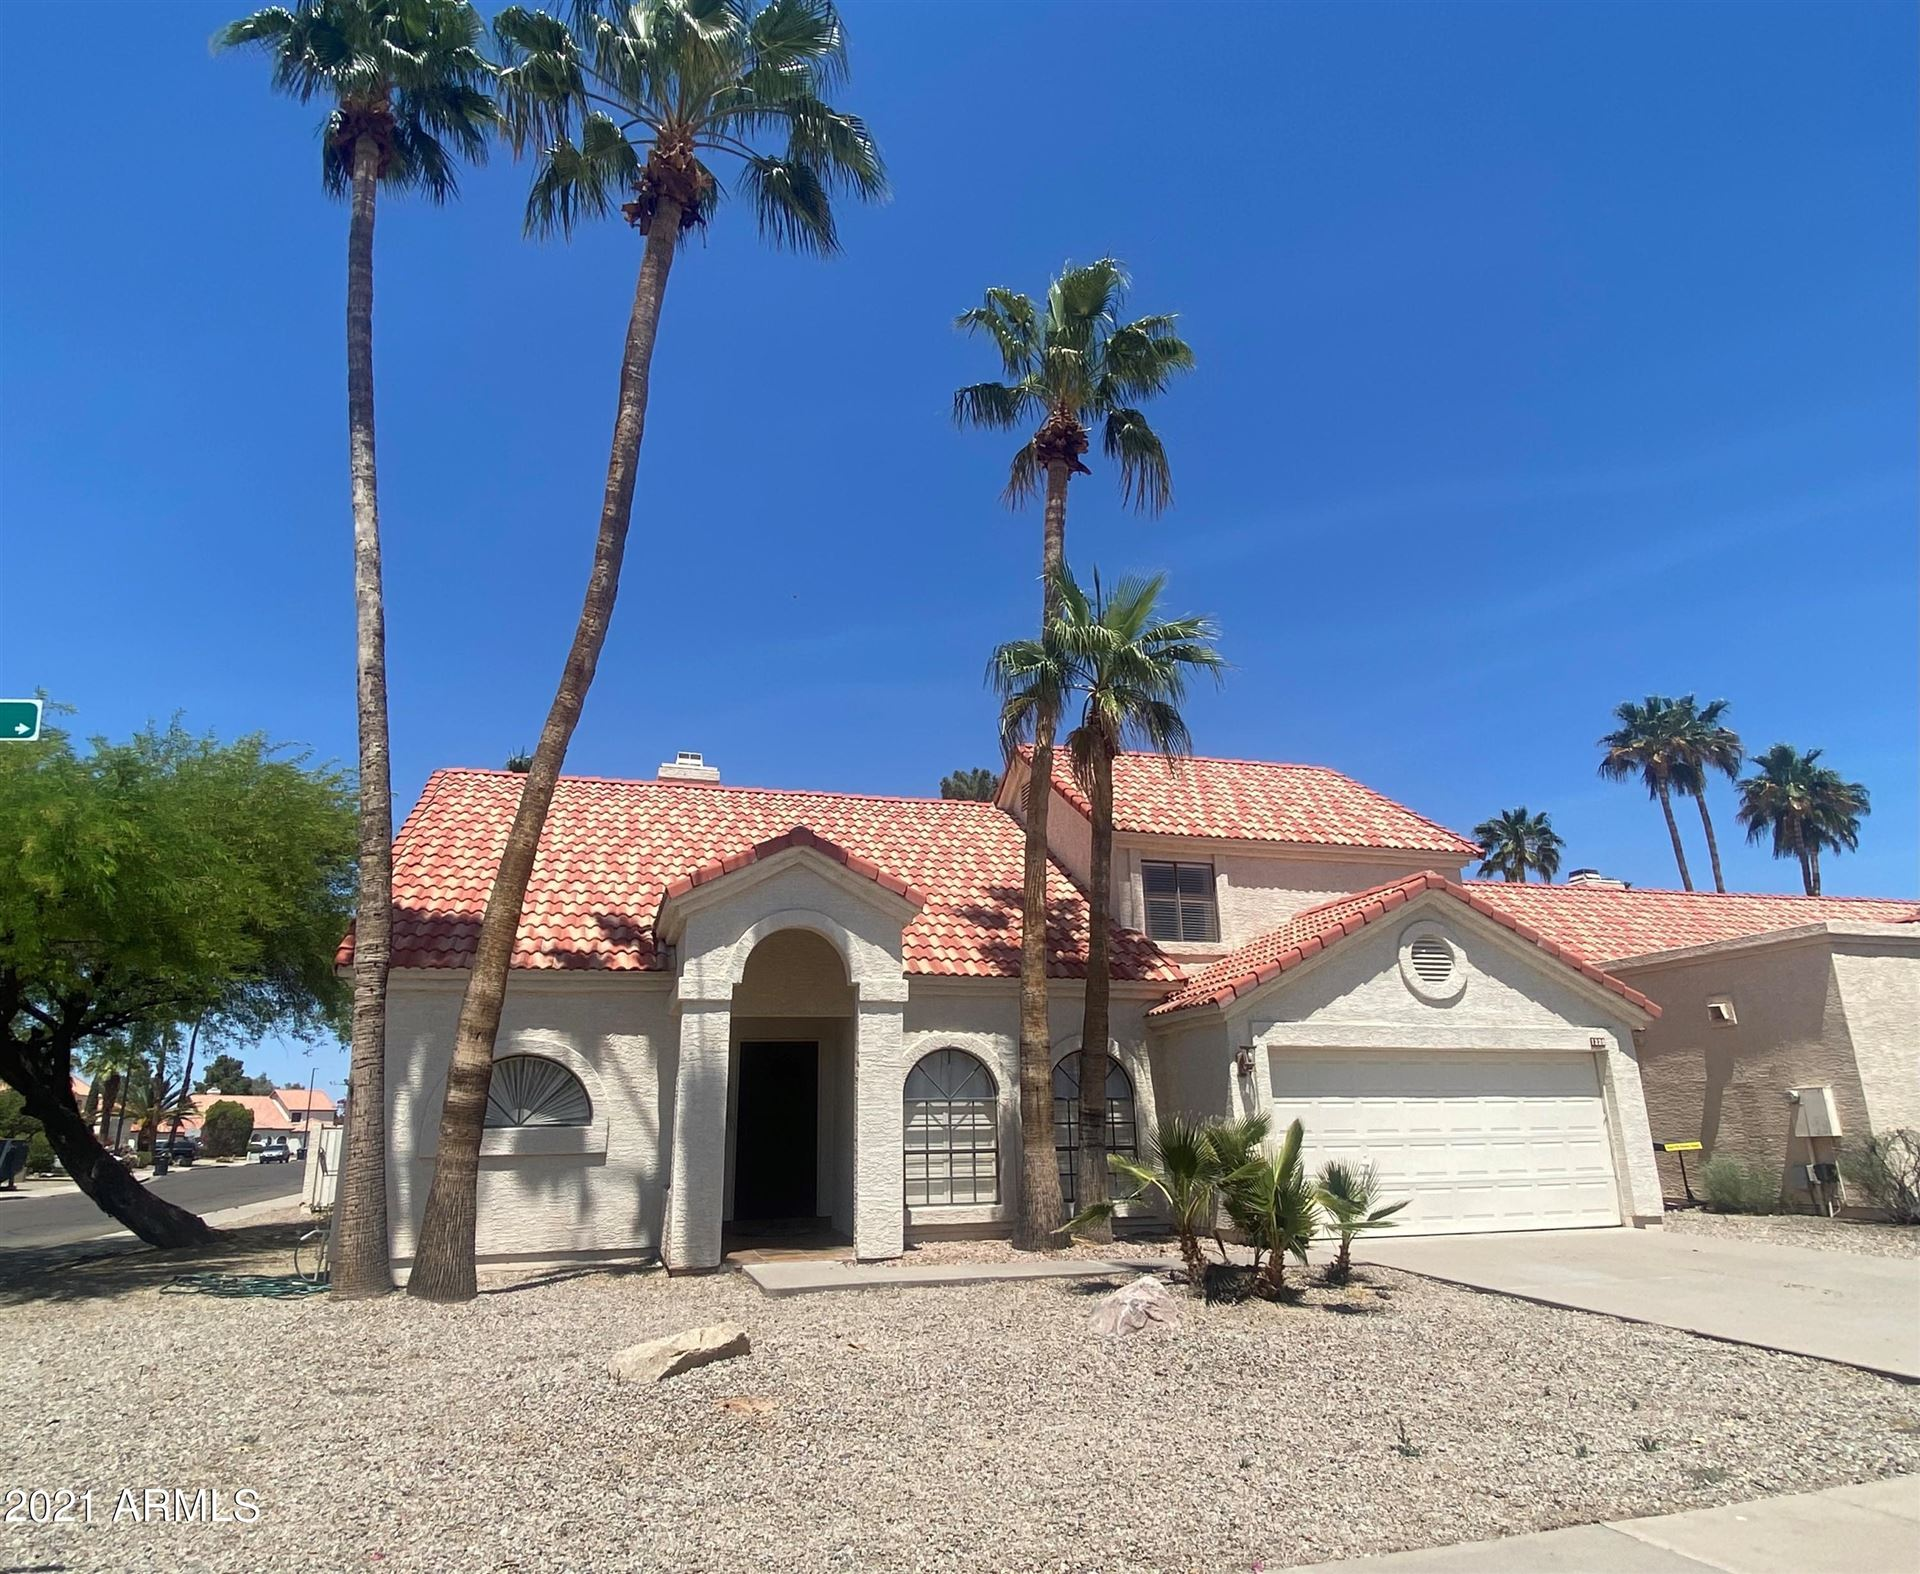 Photo of 1220 E CAMPBELL Avenue, Gilbert, AZ 85234 (MLS # 6249787)